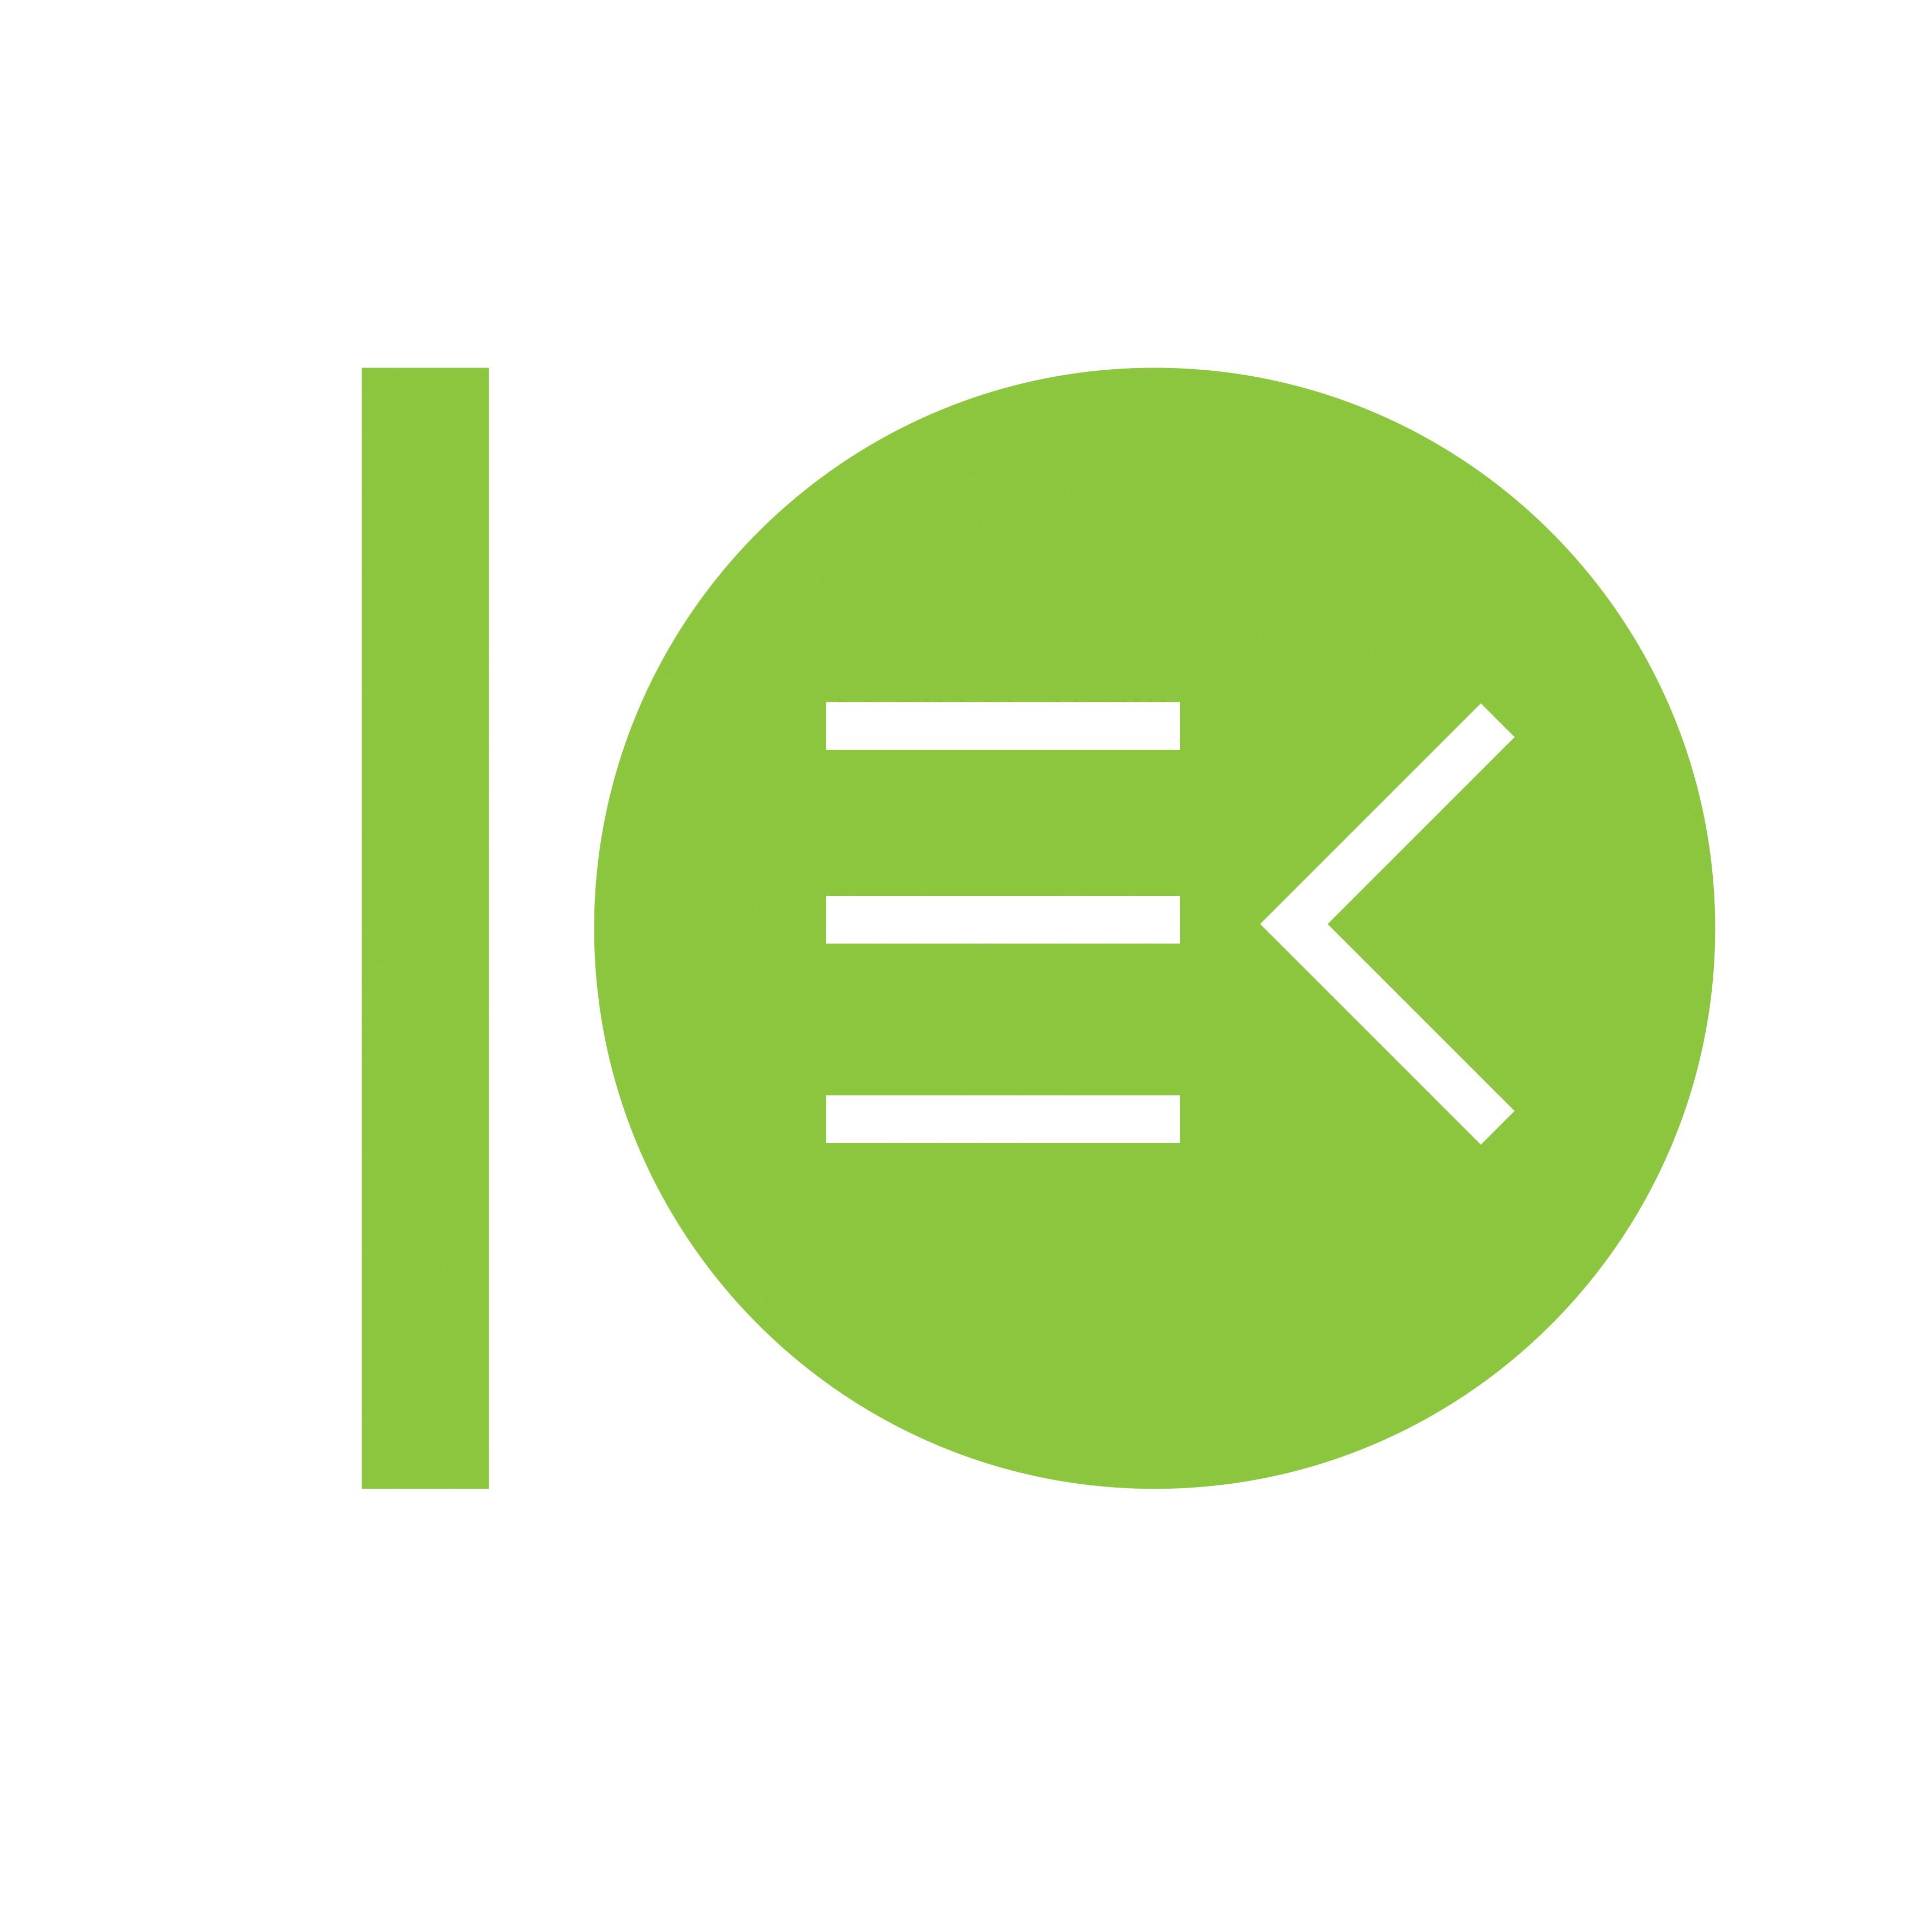 ek_evfordulos_logo